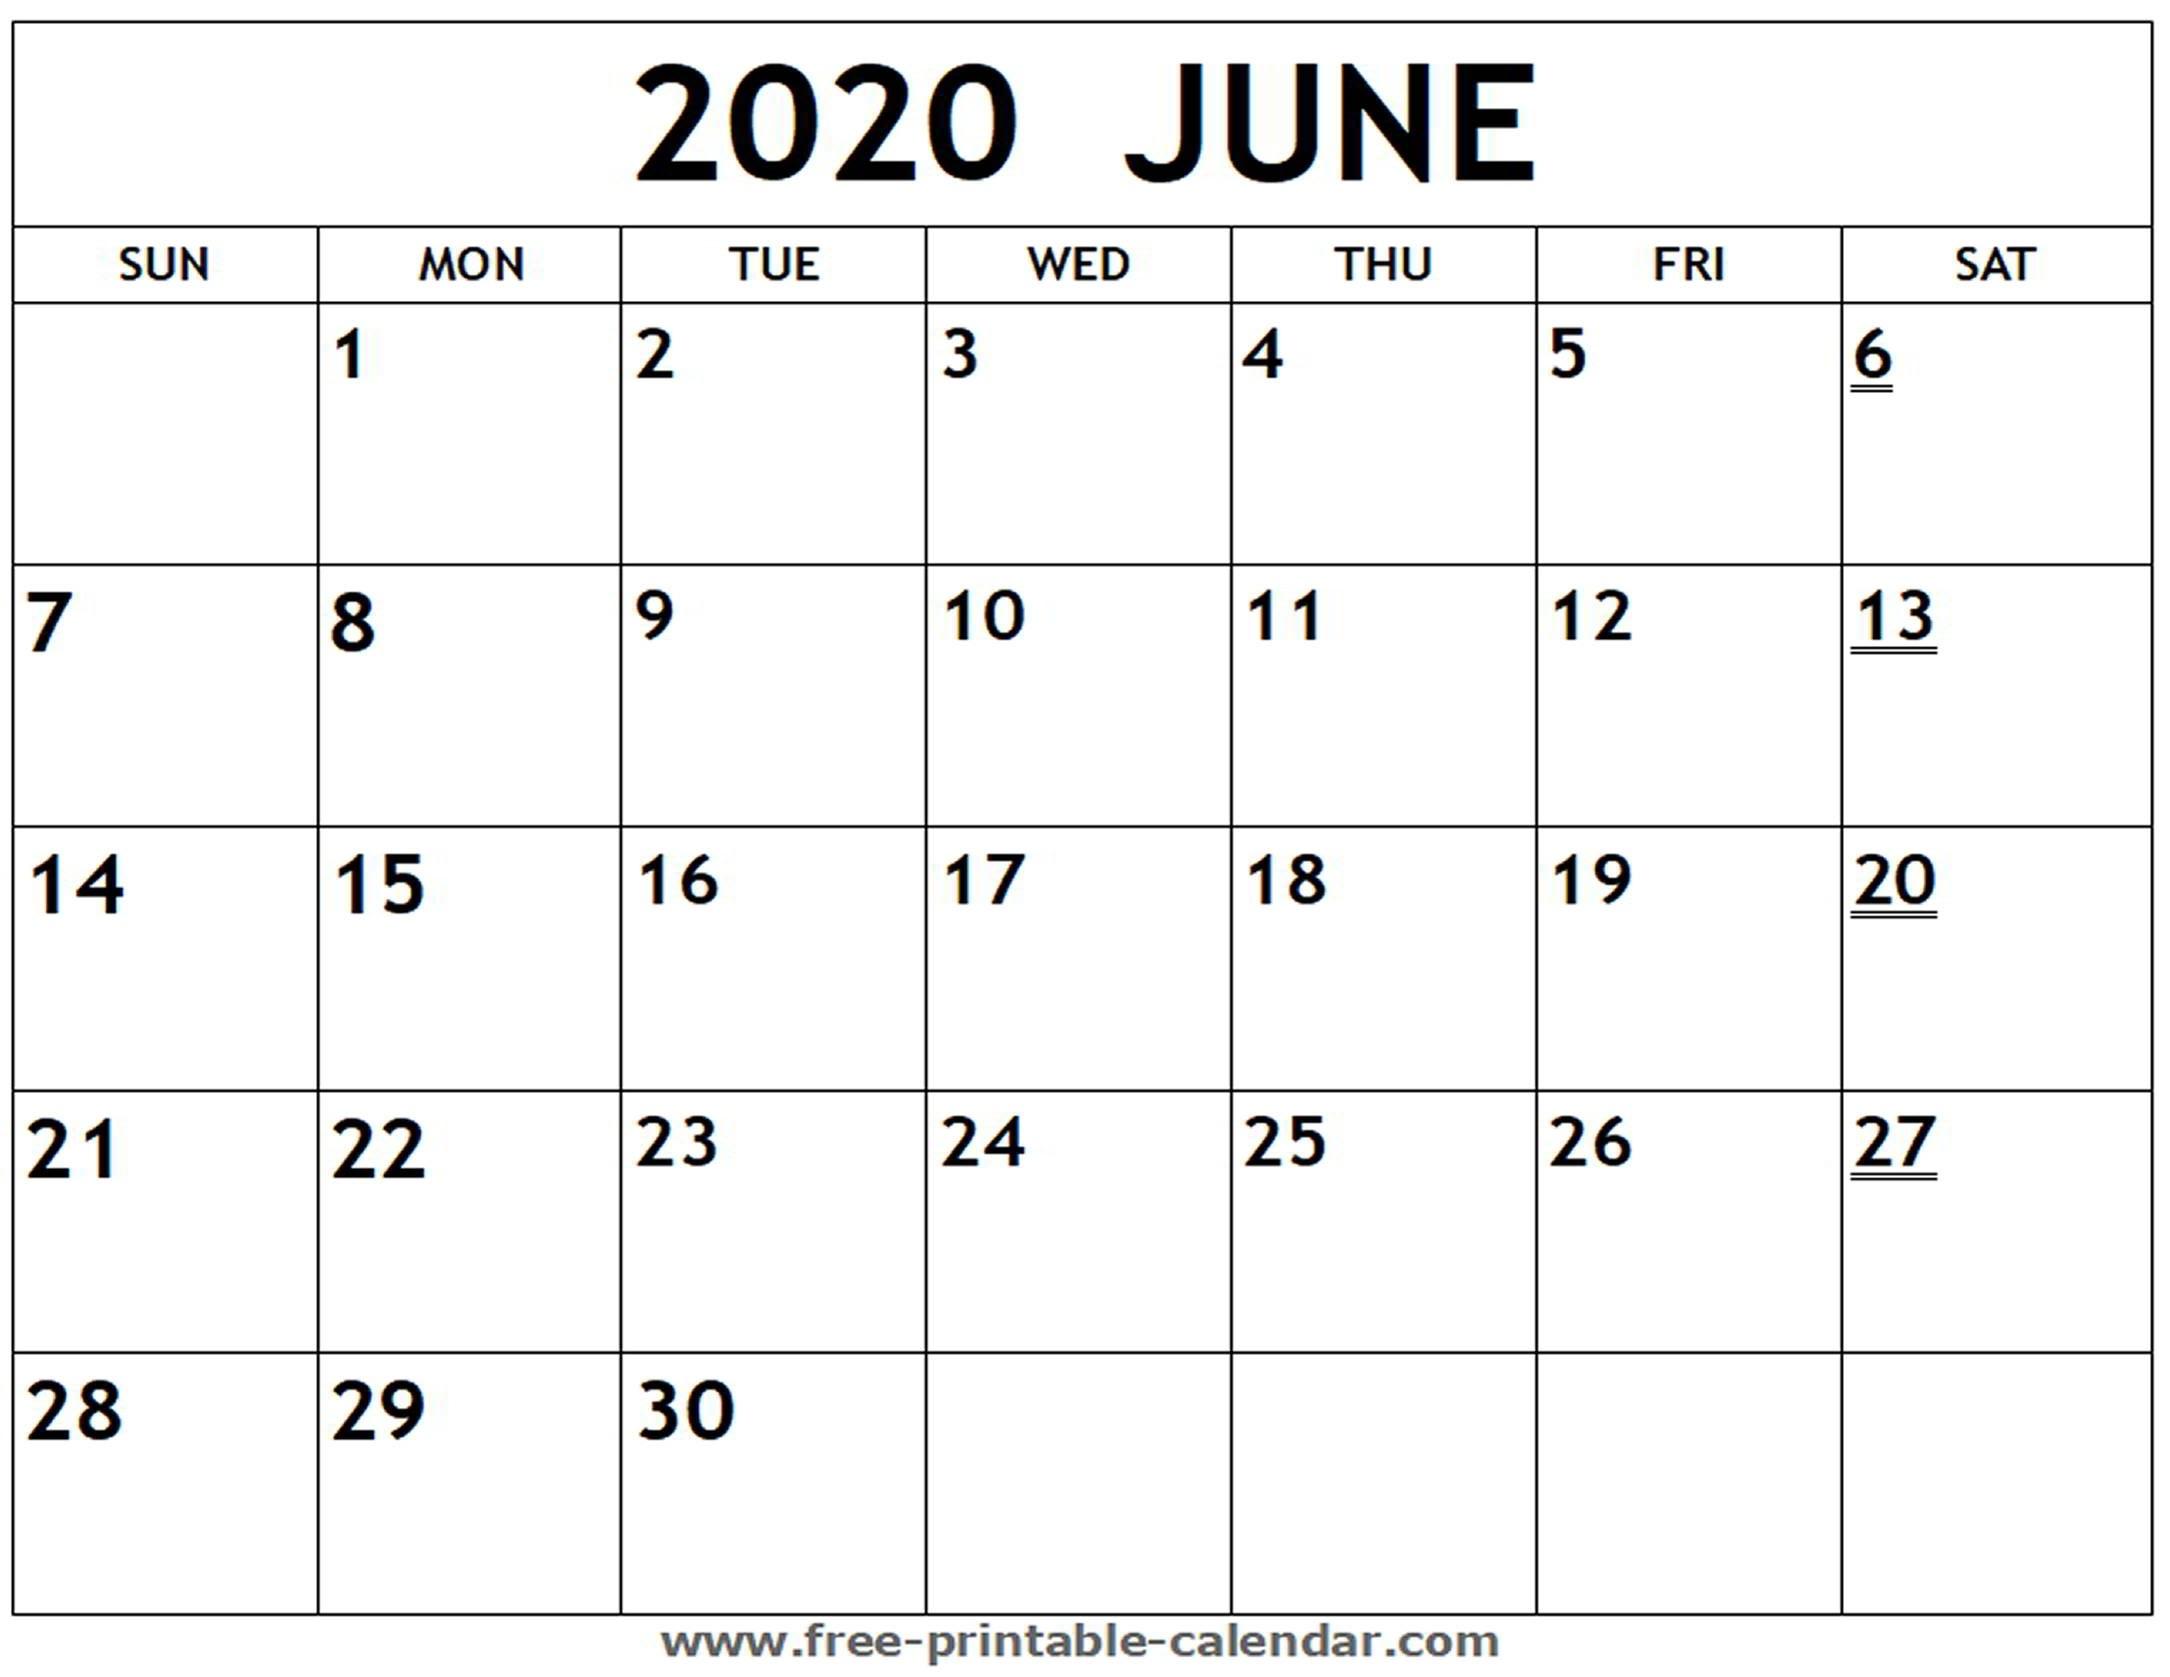 Printable 2020 June Calendar - Free-Printable-Calendar-Blank Calendar 2020 June July August